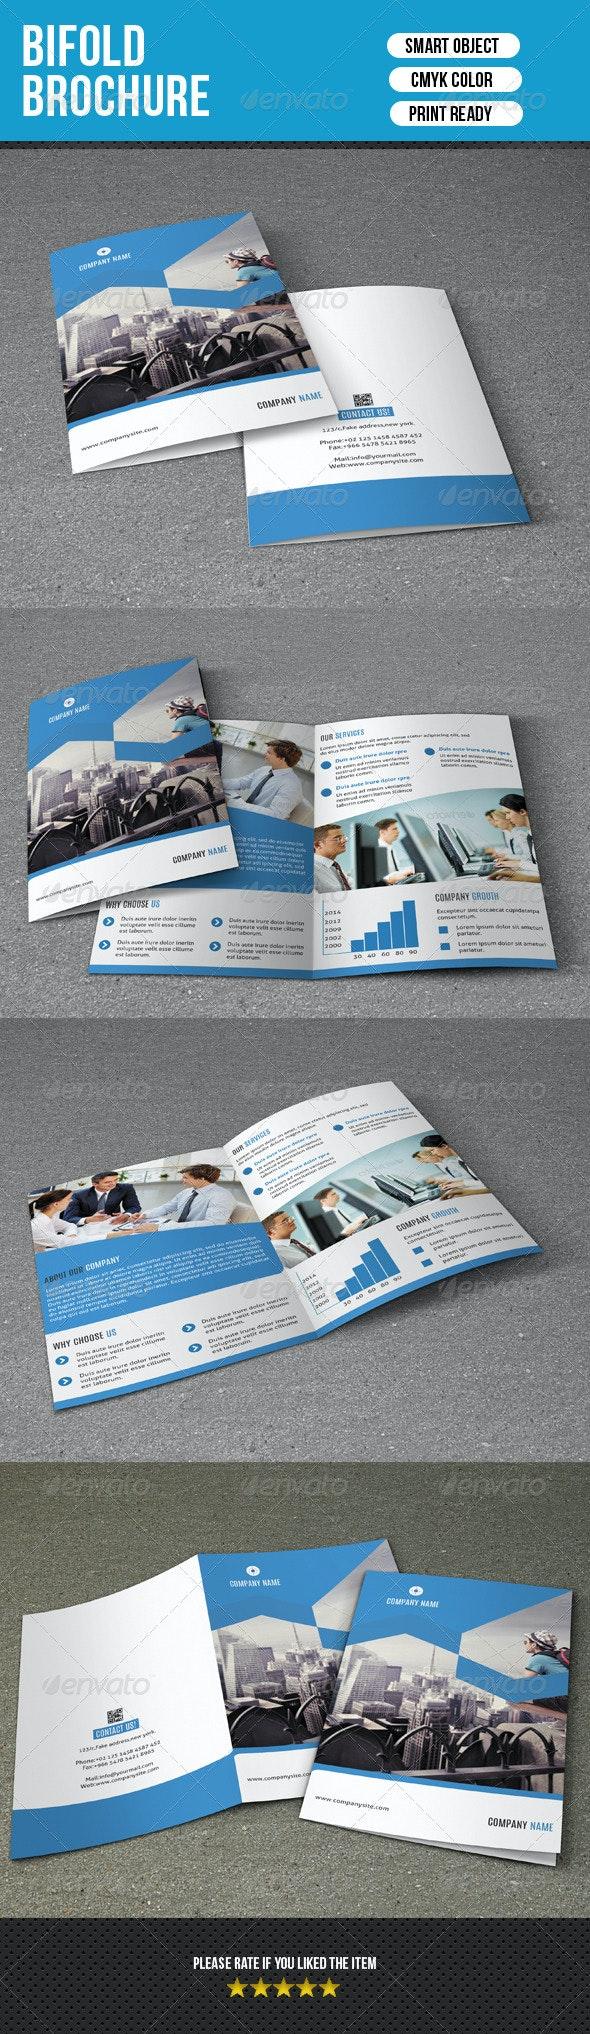 Bifold Business Brochure-V117 - Corporate Brochures